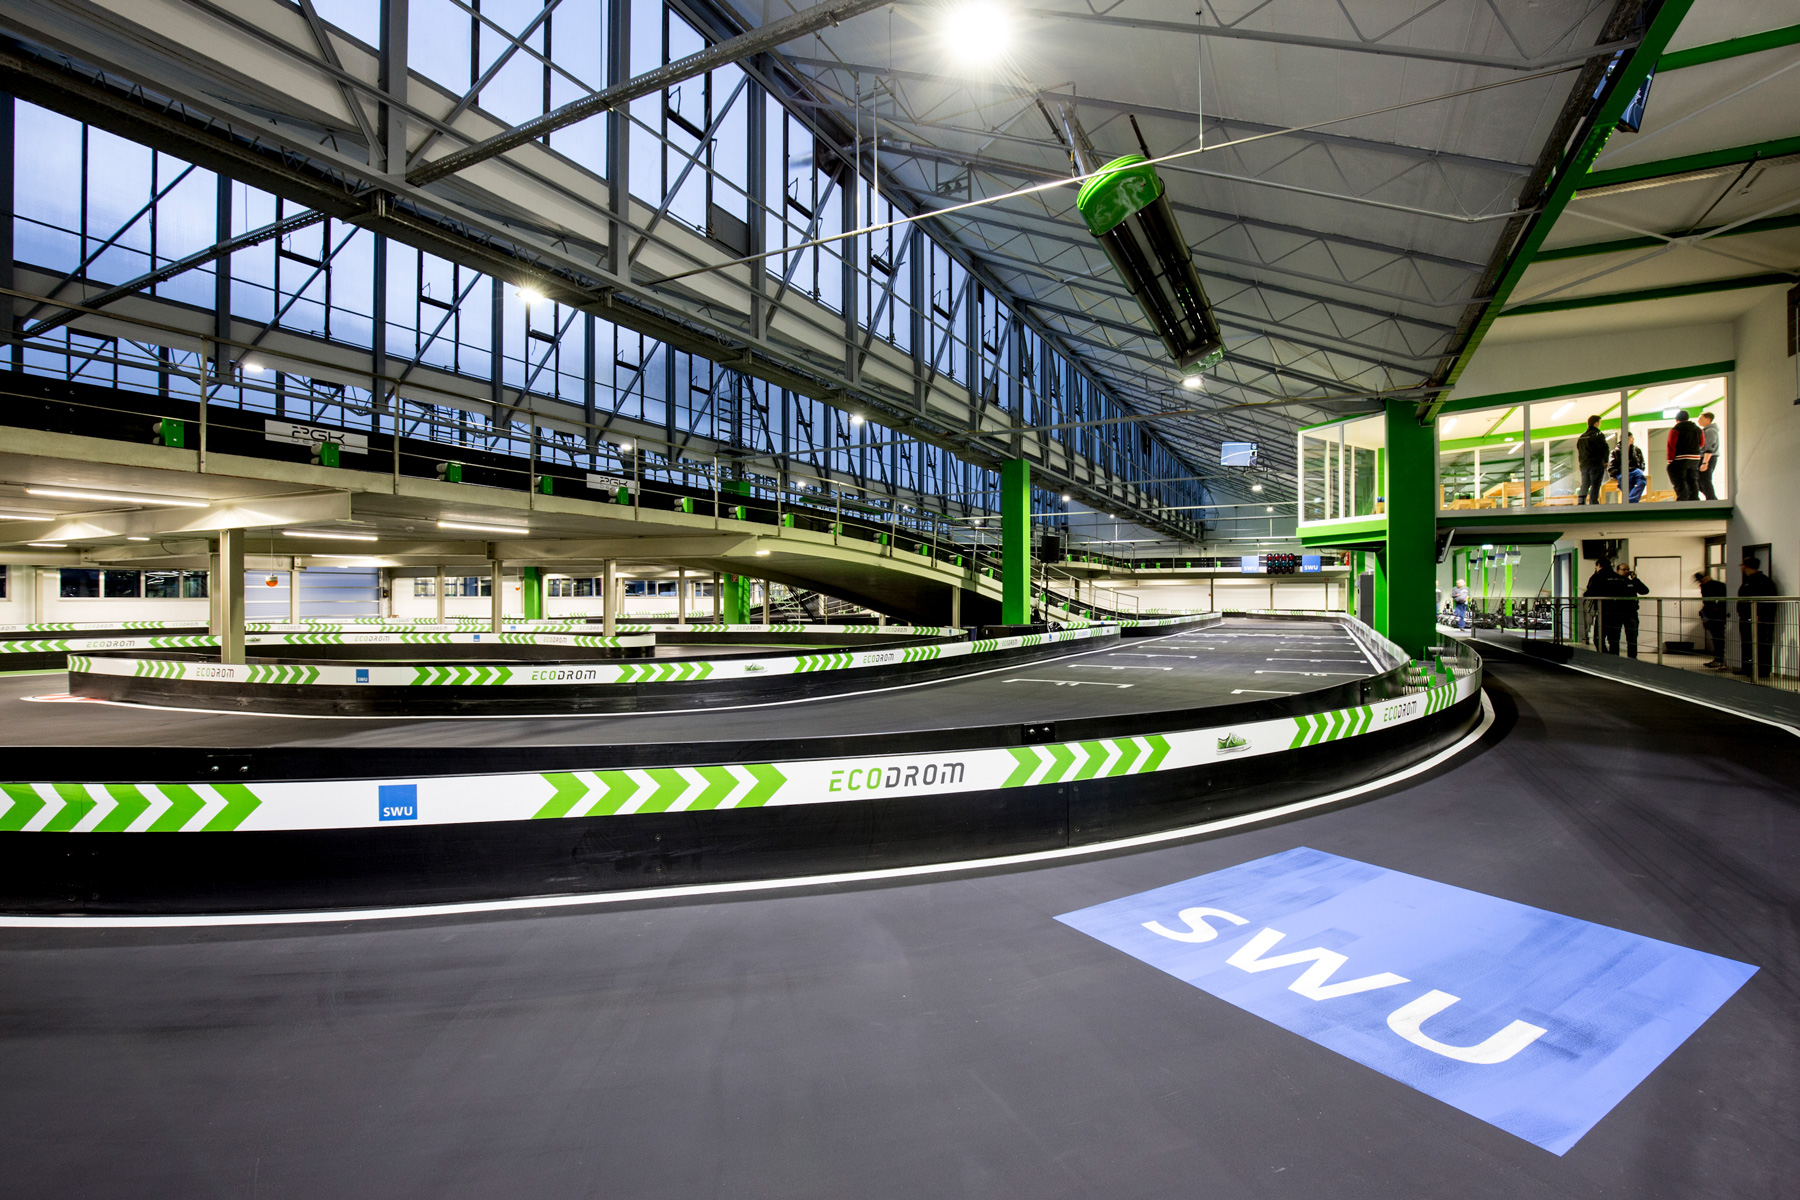 Ecodrom - Kartbahn